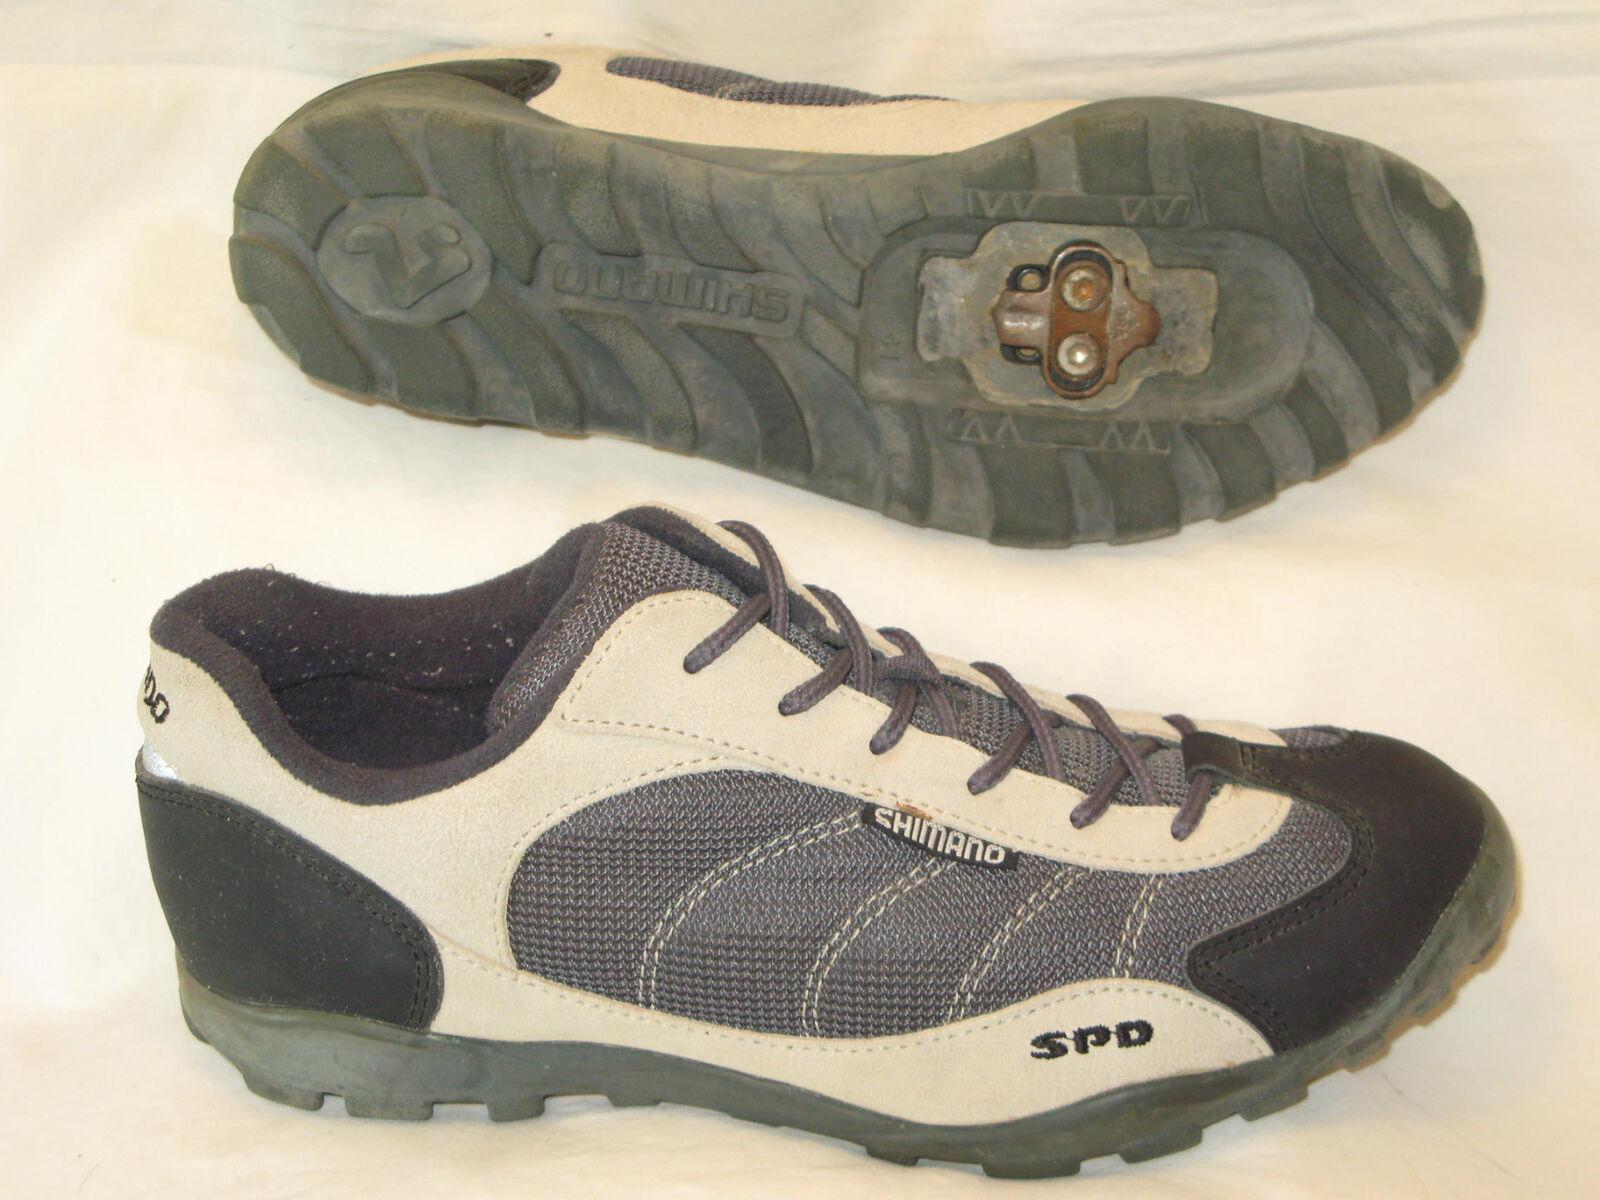 Shimano Schaft M020 Mountainbike Schuhe Eu 41 USA Damen Damen Damen Größe 9 Herren 7.5 49001a